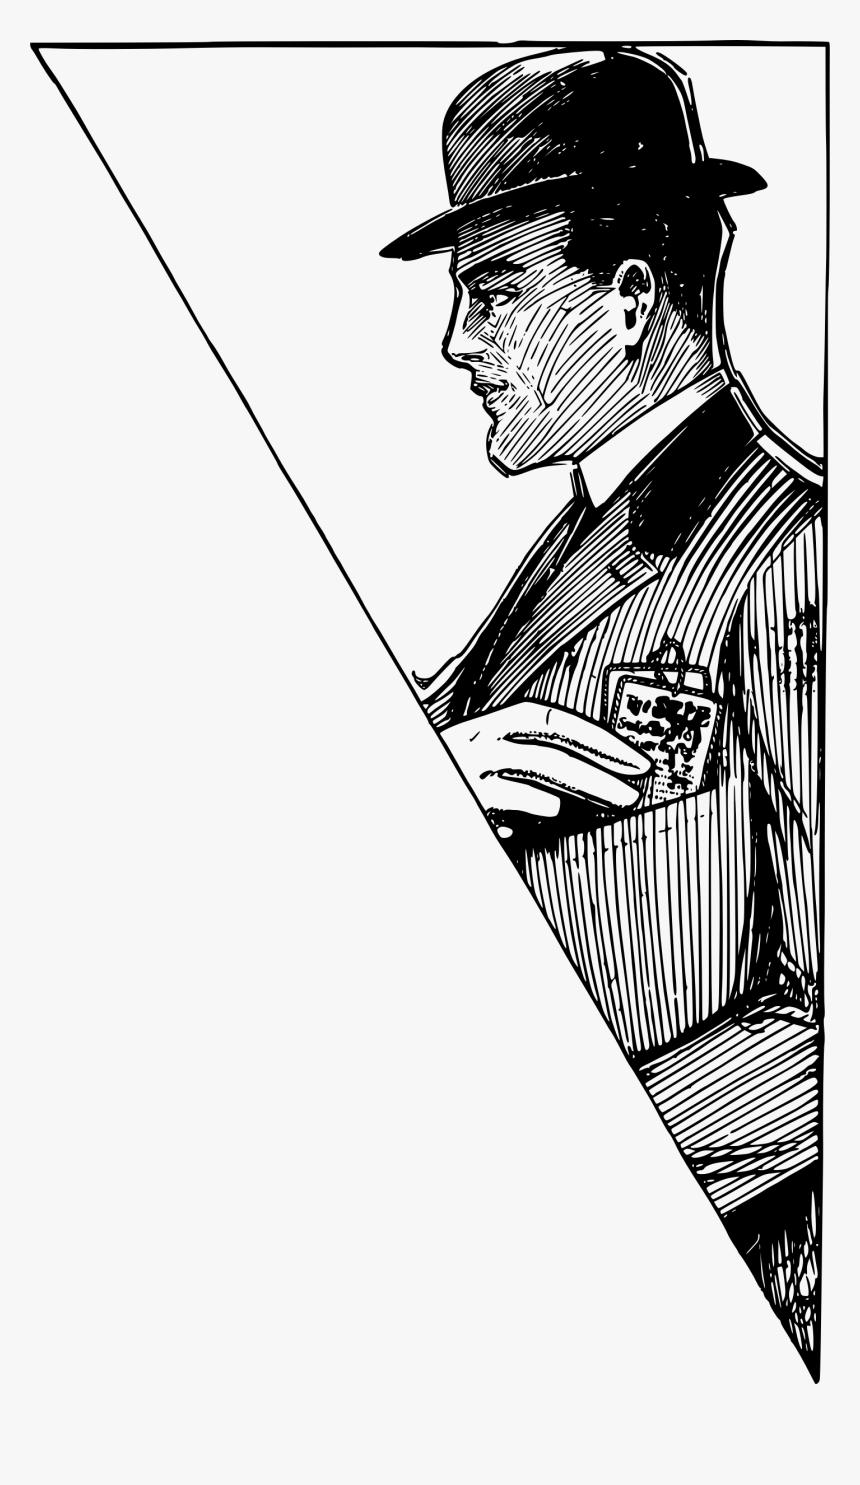 Suit clipart formal guy, Picture #3179289 suit clipart formal guy